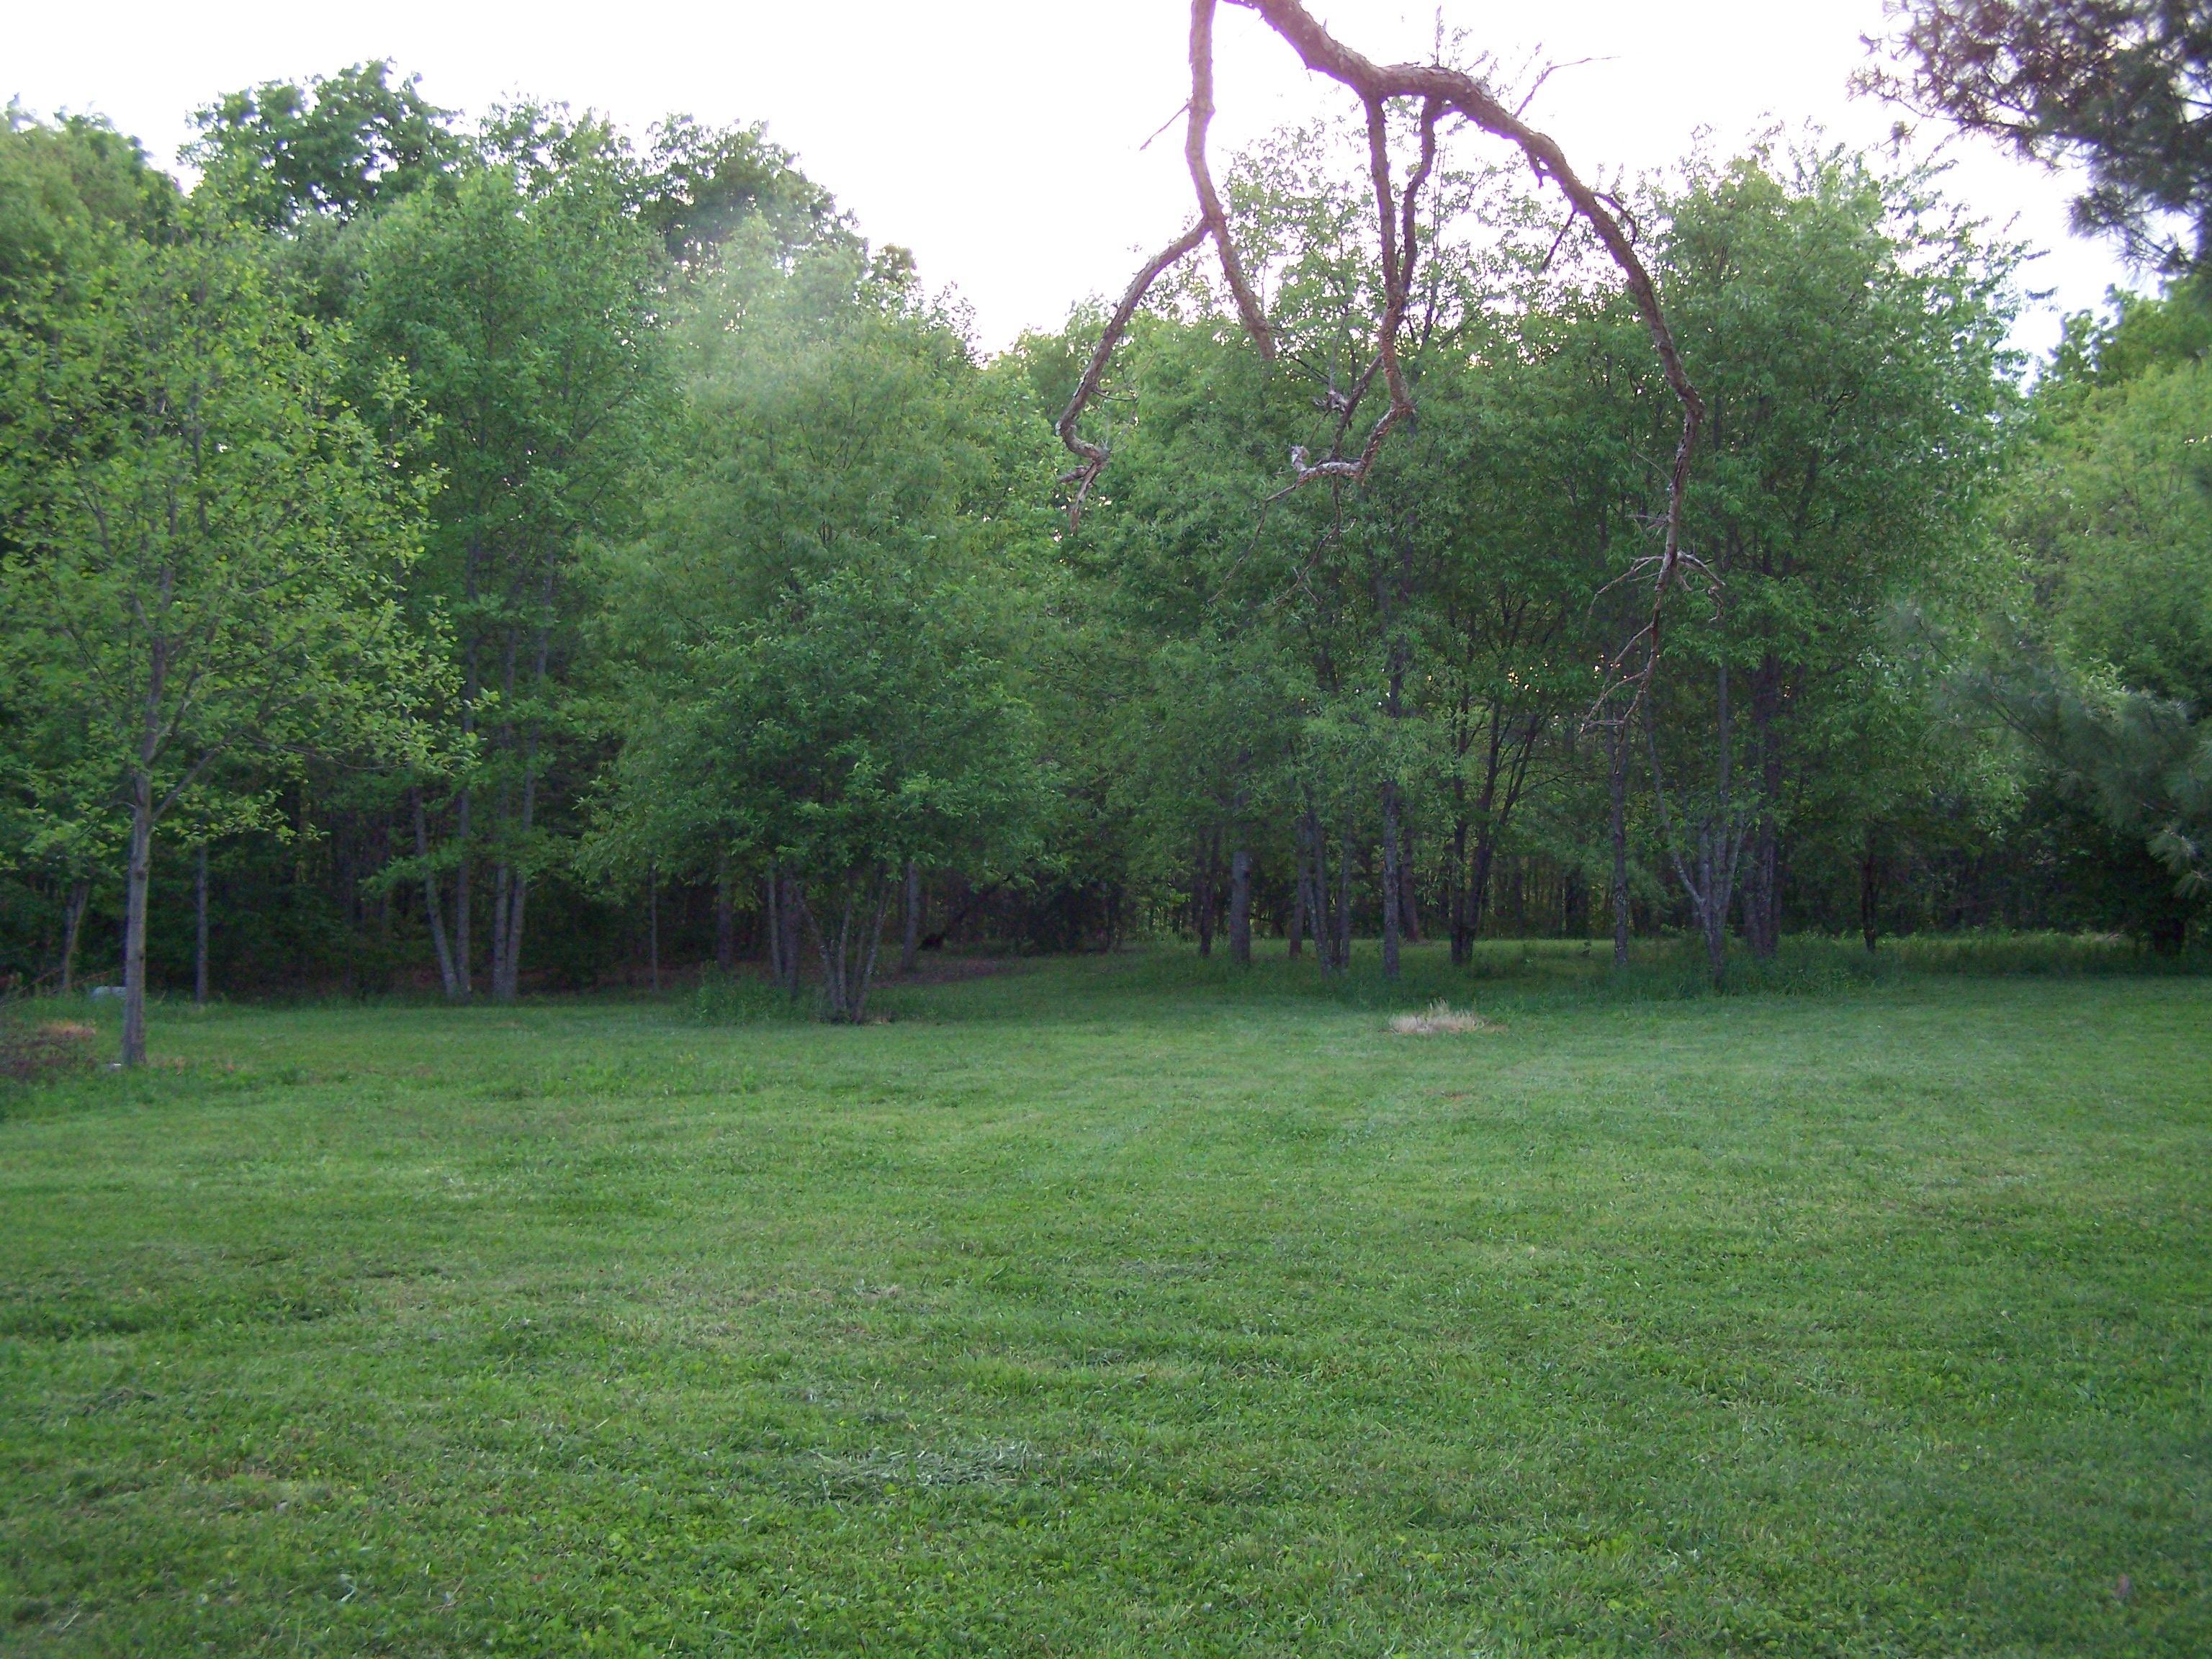 Garden Design Ideas For Acreage : Ideas for landscaping acreage frugal gardening momma